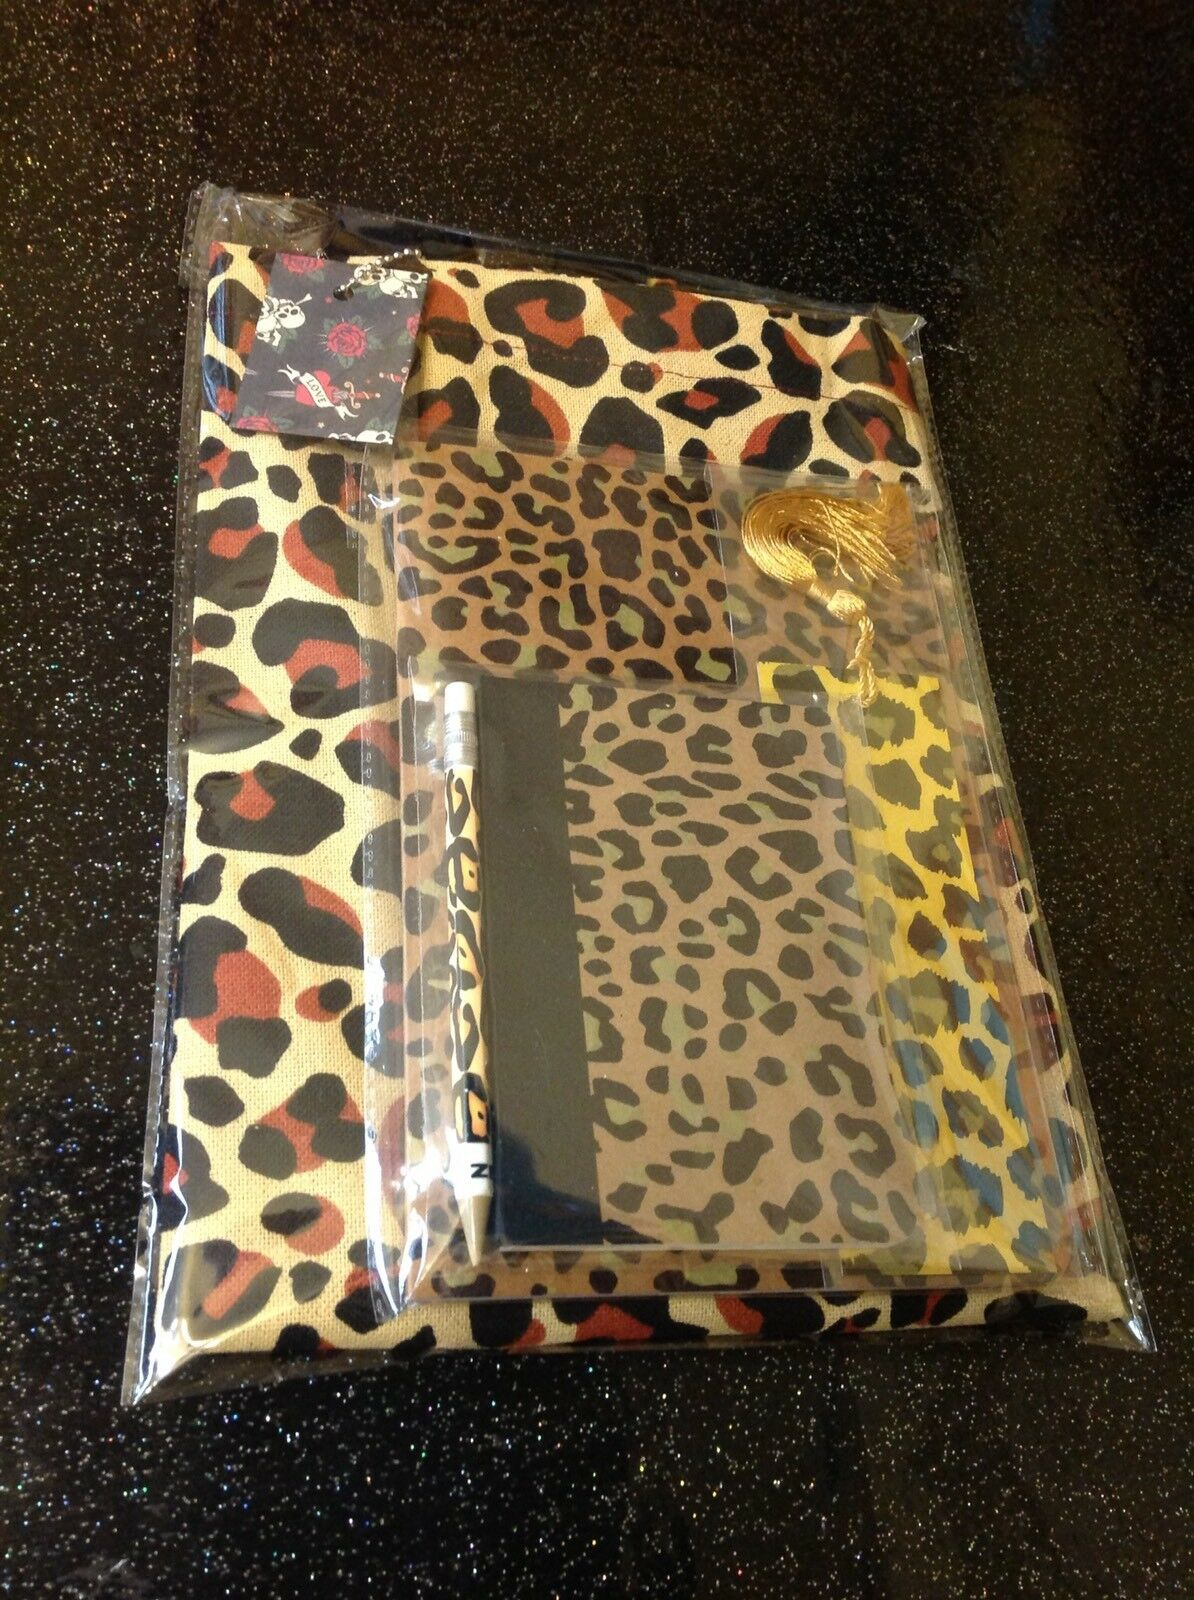 Retro Rockabilly Leopard Print Tote Bag +2 Notebooks +Pencil +Bookmark 5pc Set